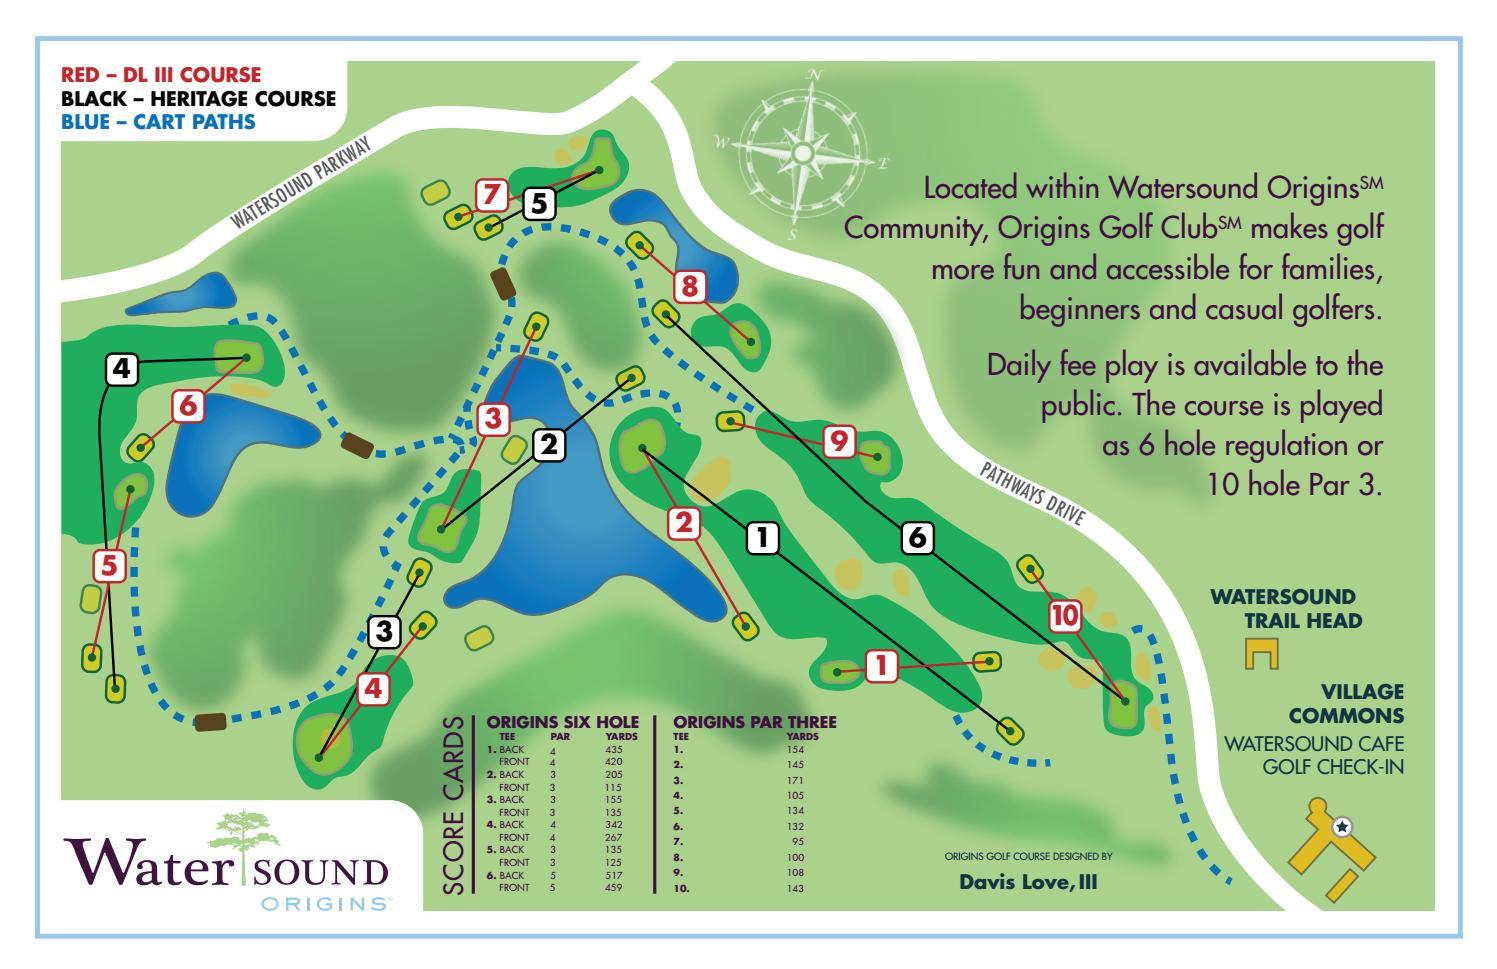 Origins Golf Club Course Map By St Joe Hospitality Issuu